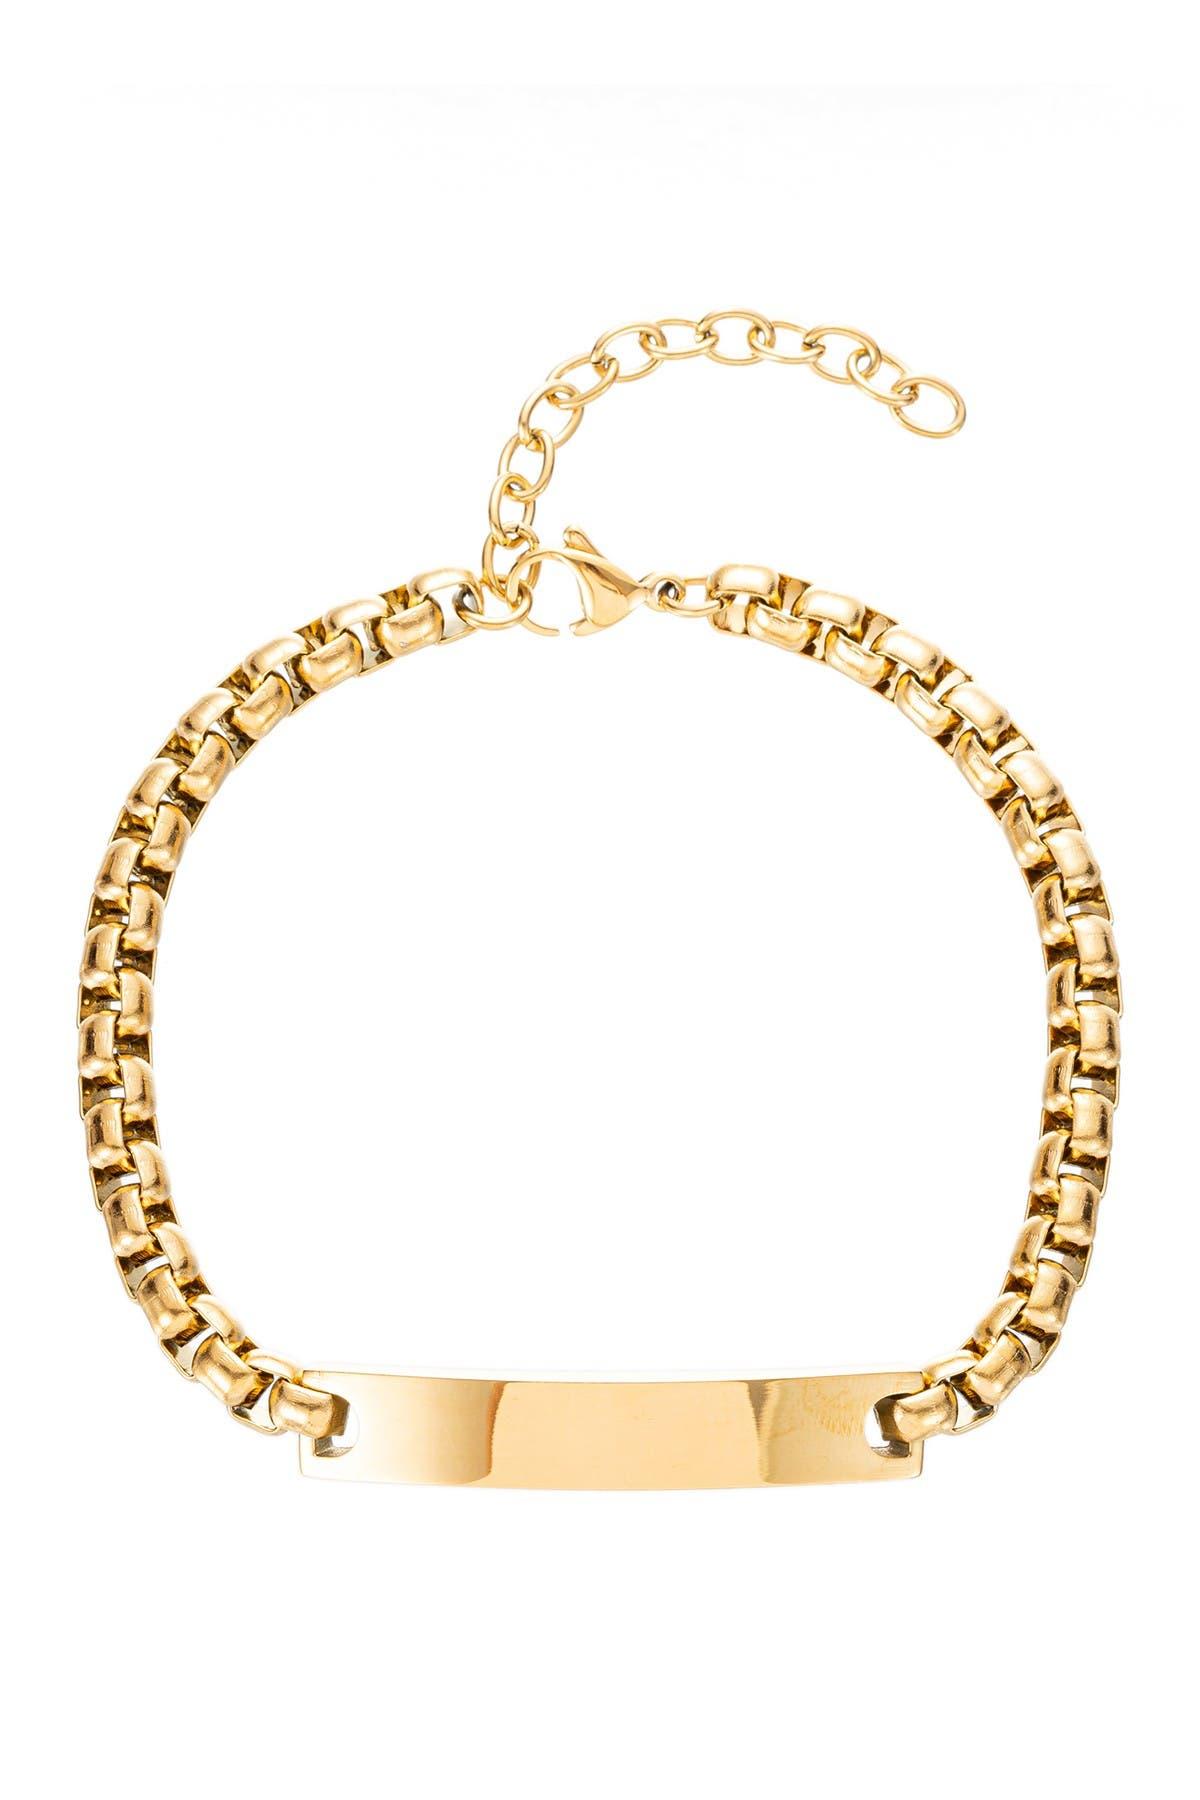 Image of Eye Candy Los Angeles Christopher Titanium Bar Pendant Bracelet